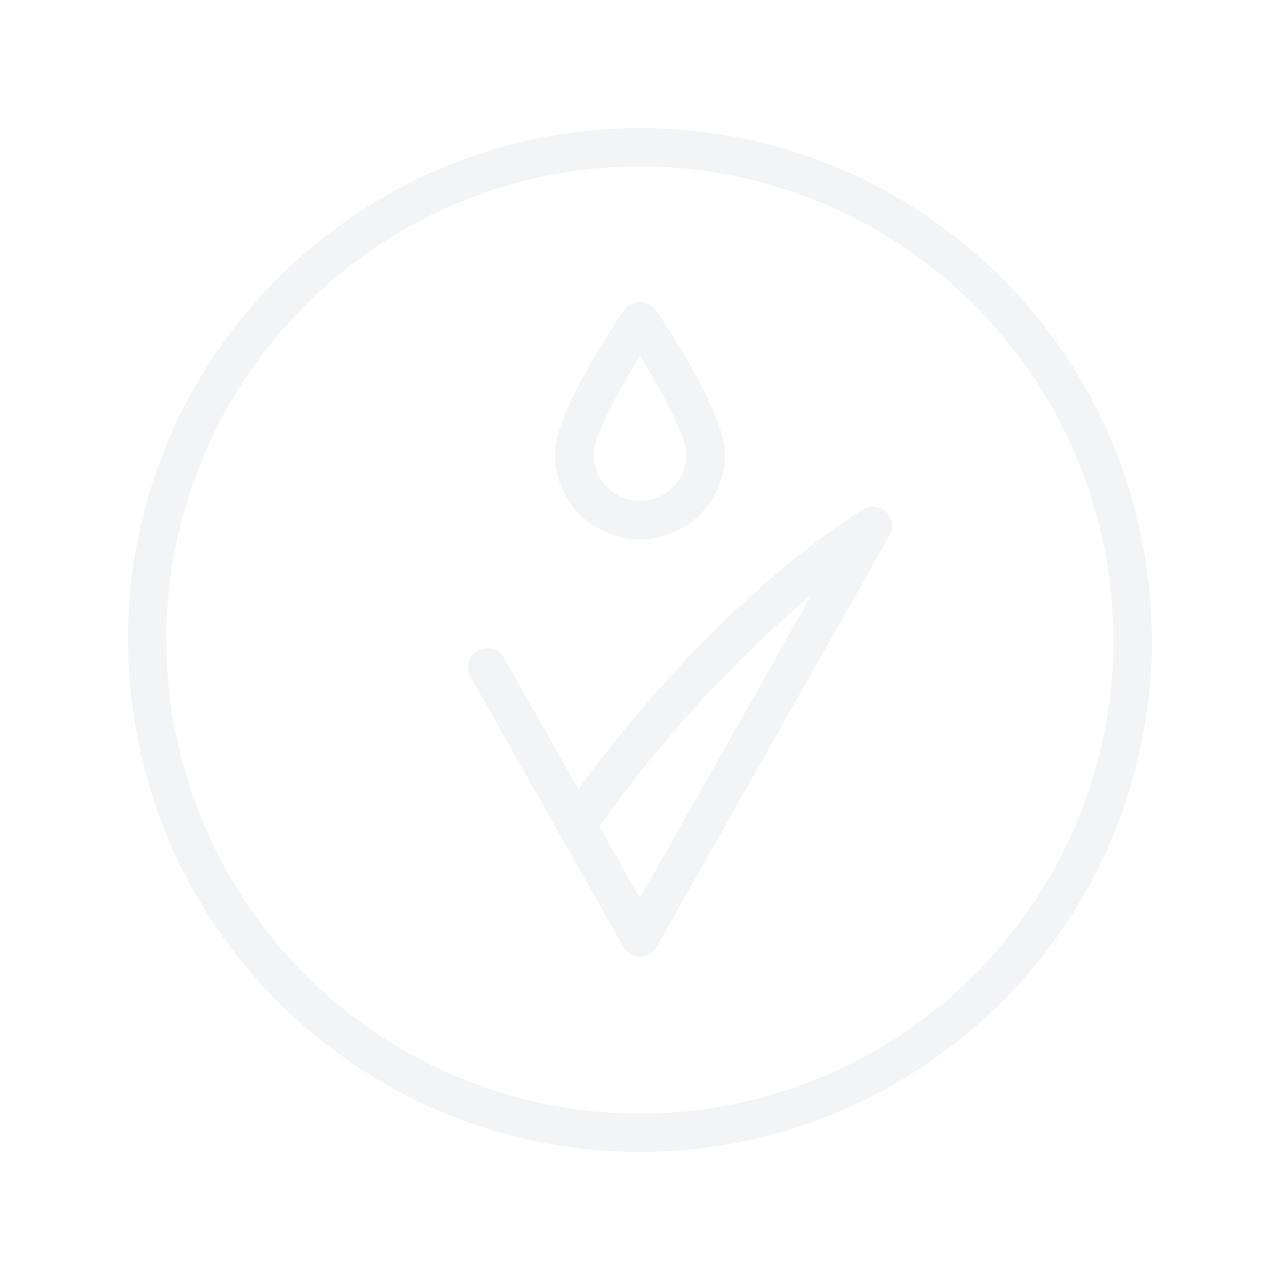 CHANEL Le Teint Ultra Matte Foundation SPF15 30ml